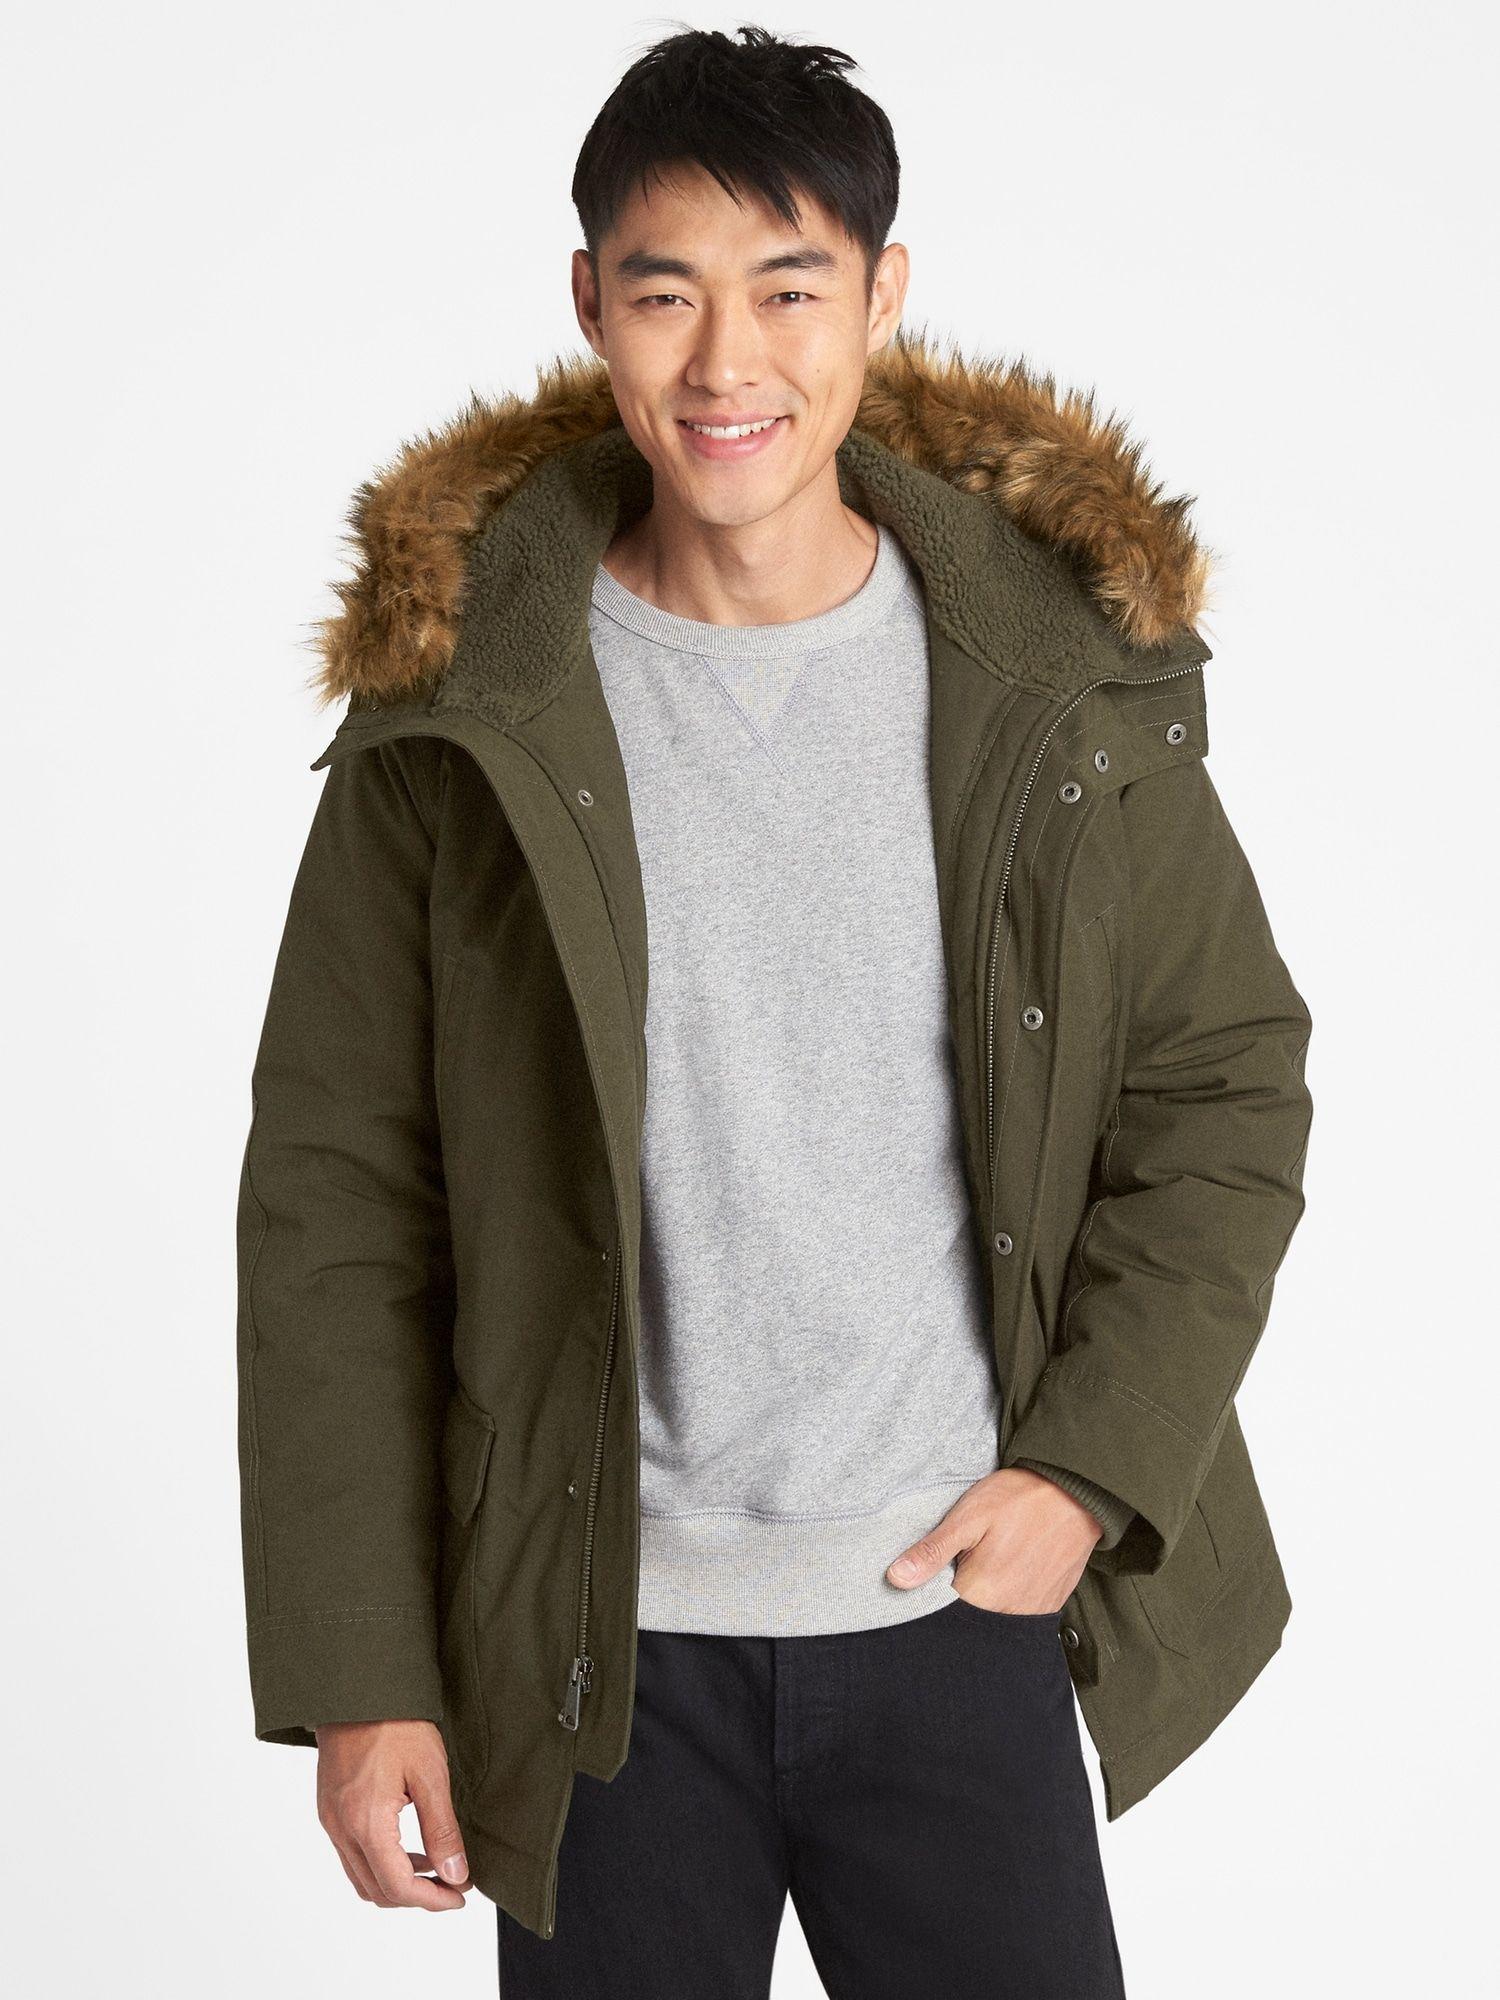 Hooded Parka Jacket With Faux Fur Trim Gap Hooded Parka Jacket Hooded Parka Parka Jacket [ 2000 x 1500 Pixel ]